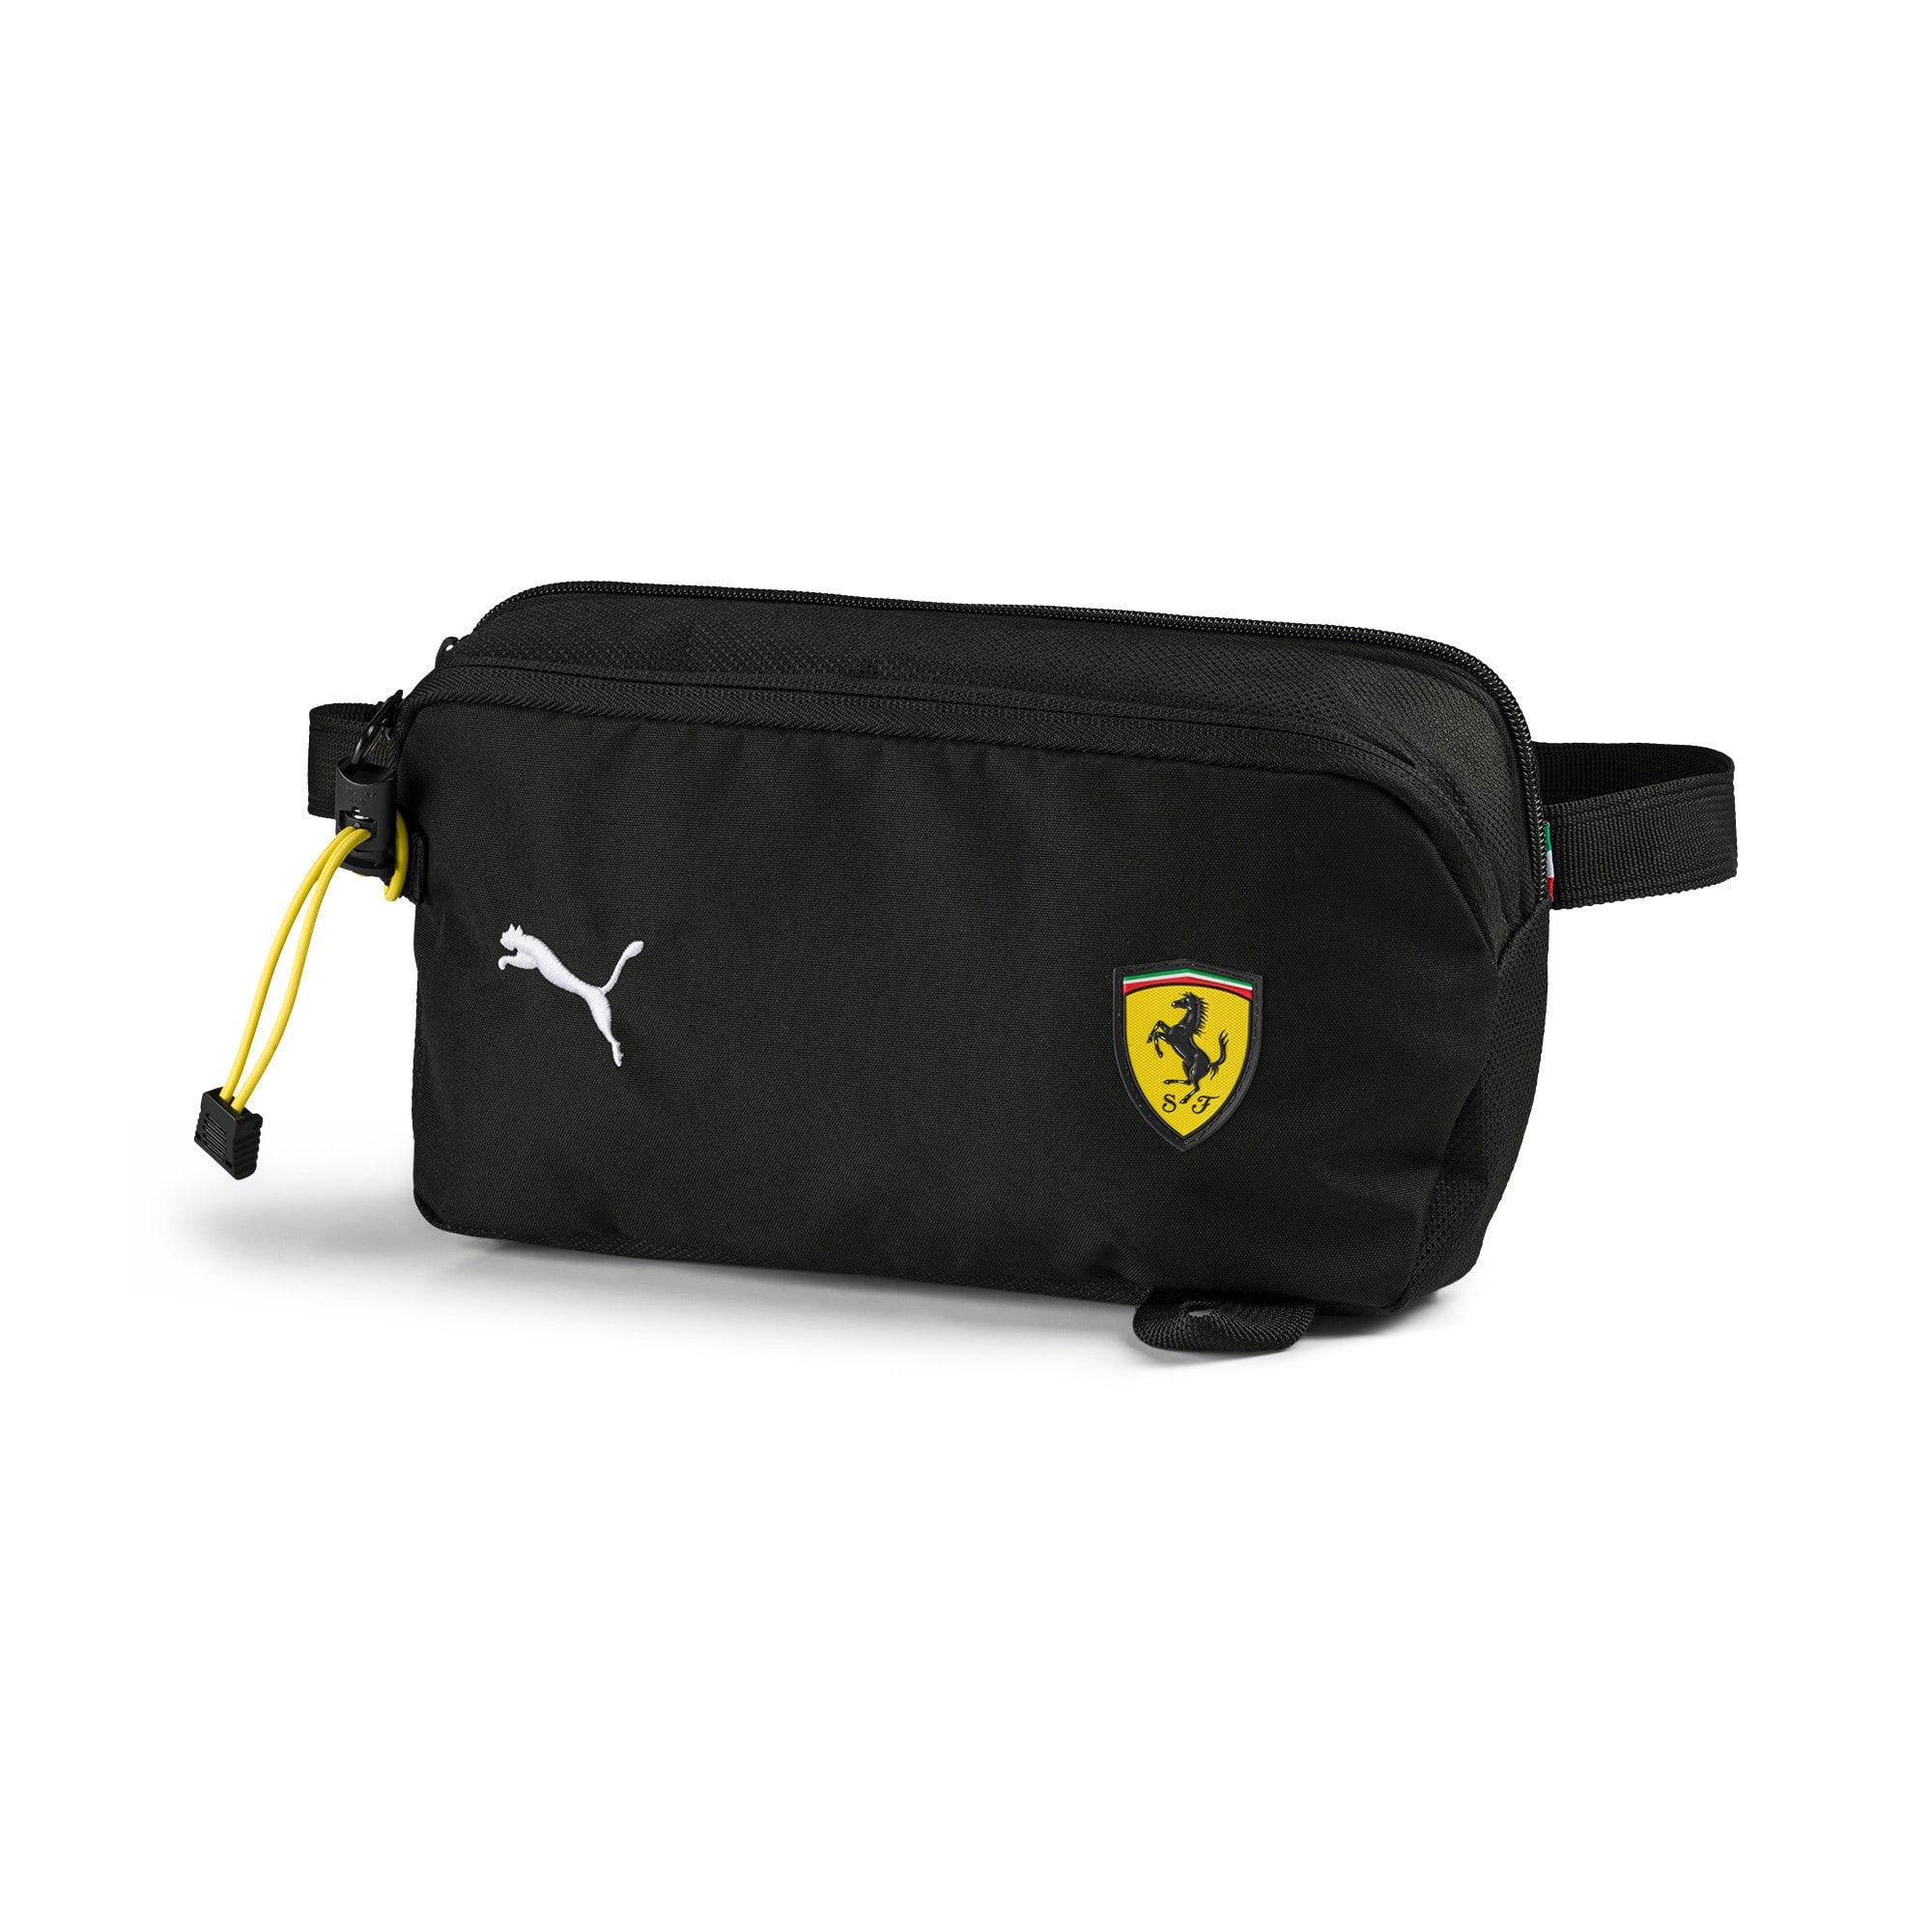 Thumbnail 1 of Ferrari Fanwear Waist Bag, Puma Black, medium-IND